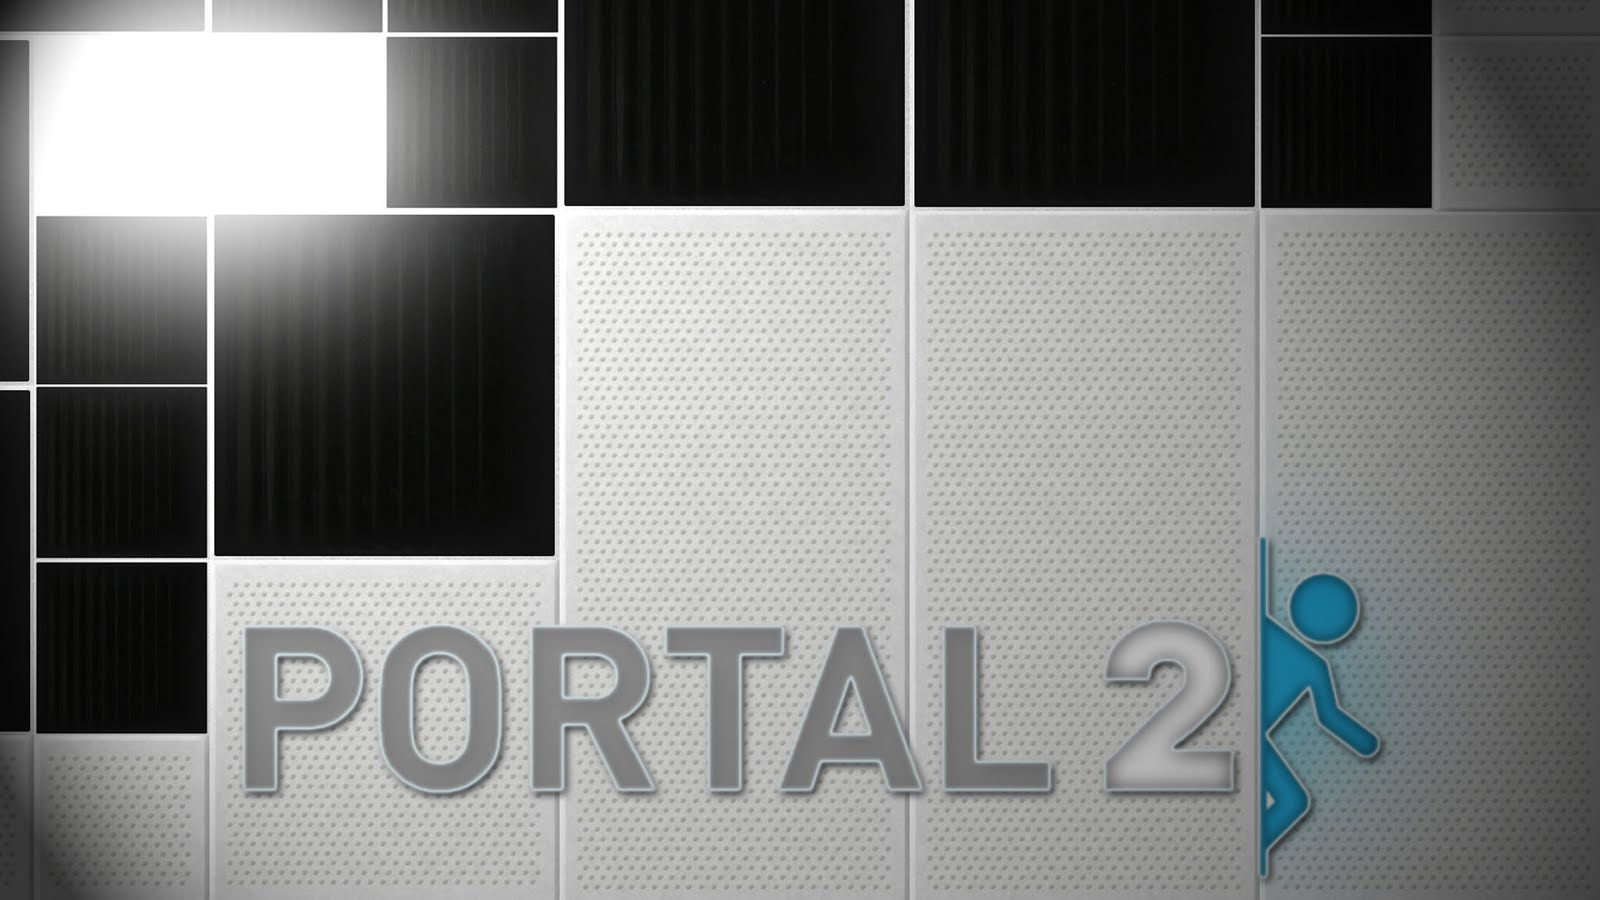 http://3.bp.blogspot.com/-V5Uoi523UNE/Tca8mm1-79I/AAAAAAAAAkg/f0OWgg56Qno/s1600/Portal+2+title+wallpaper.jpg